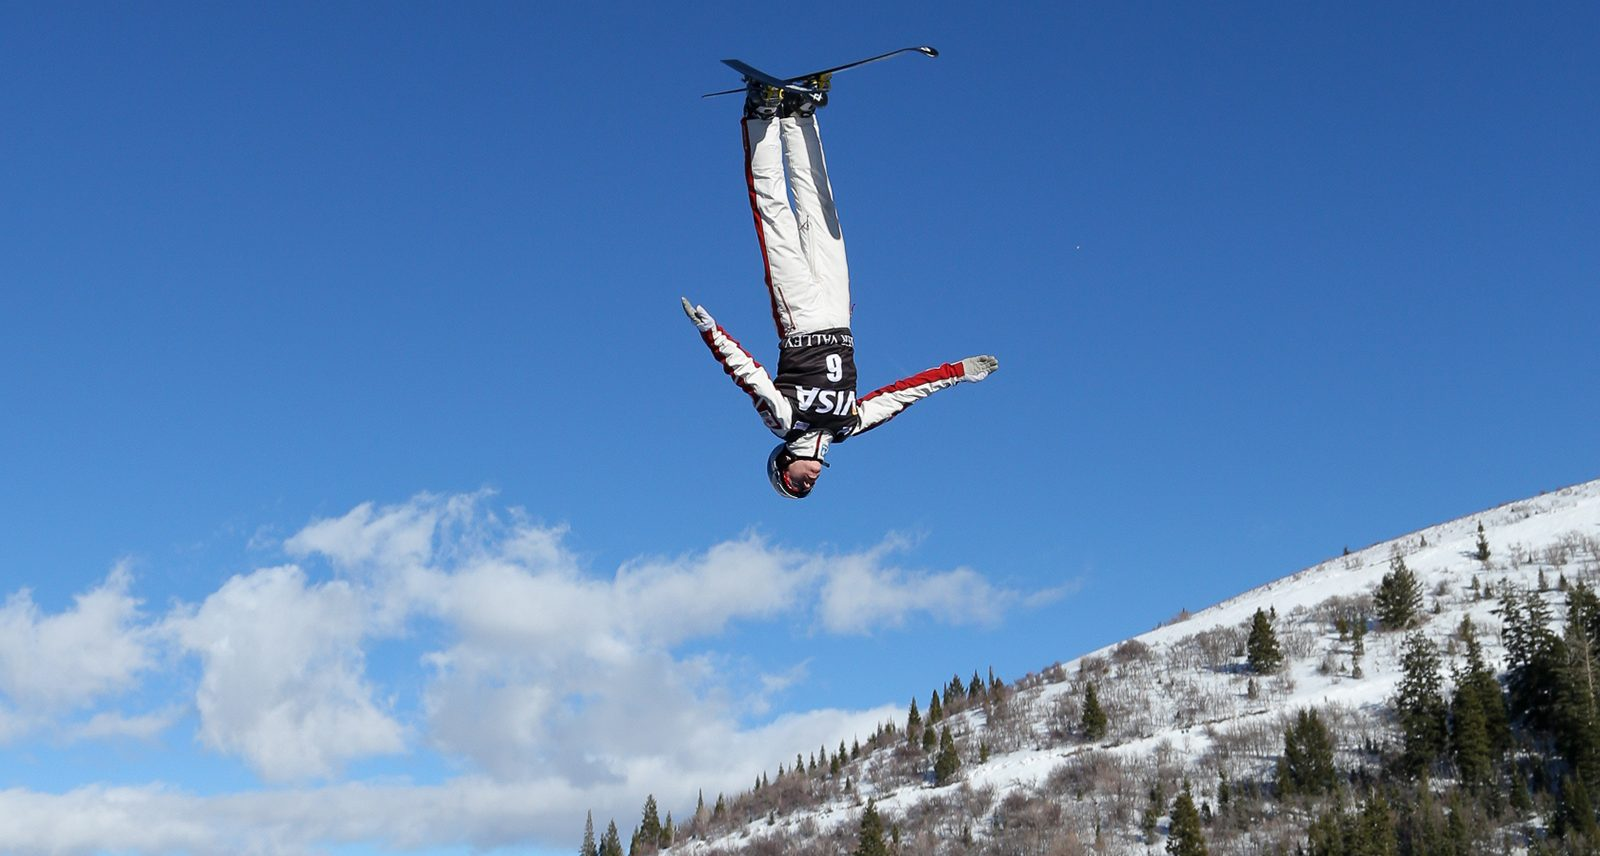 Olympic Skier Travis Gerrits on Shredding Mental Health Stigma, His Retirement, and His Next Adventure